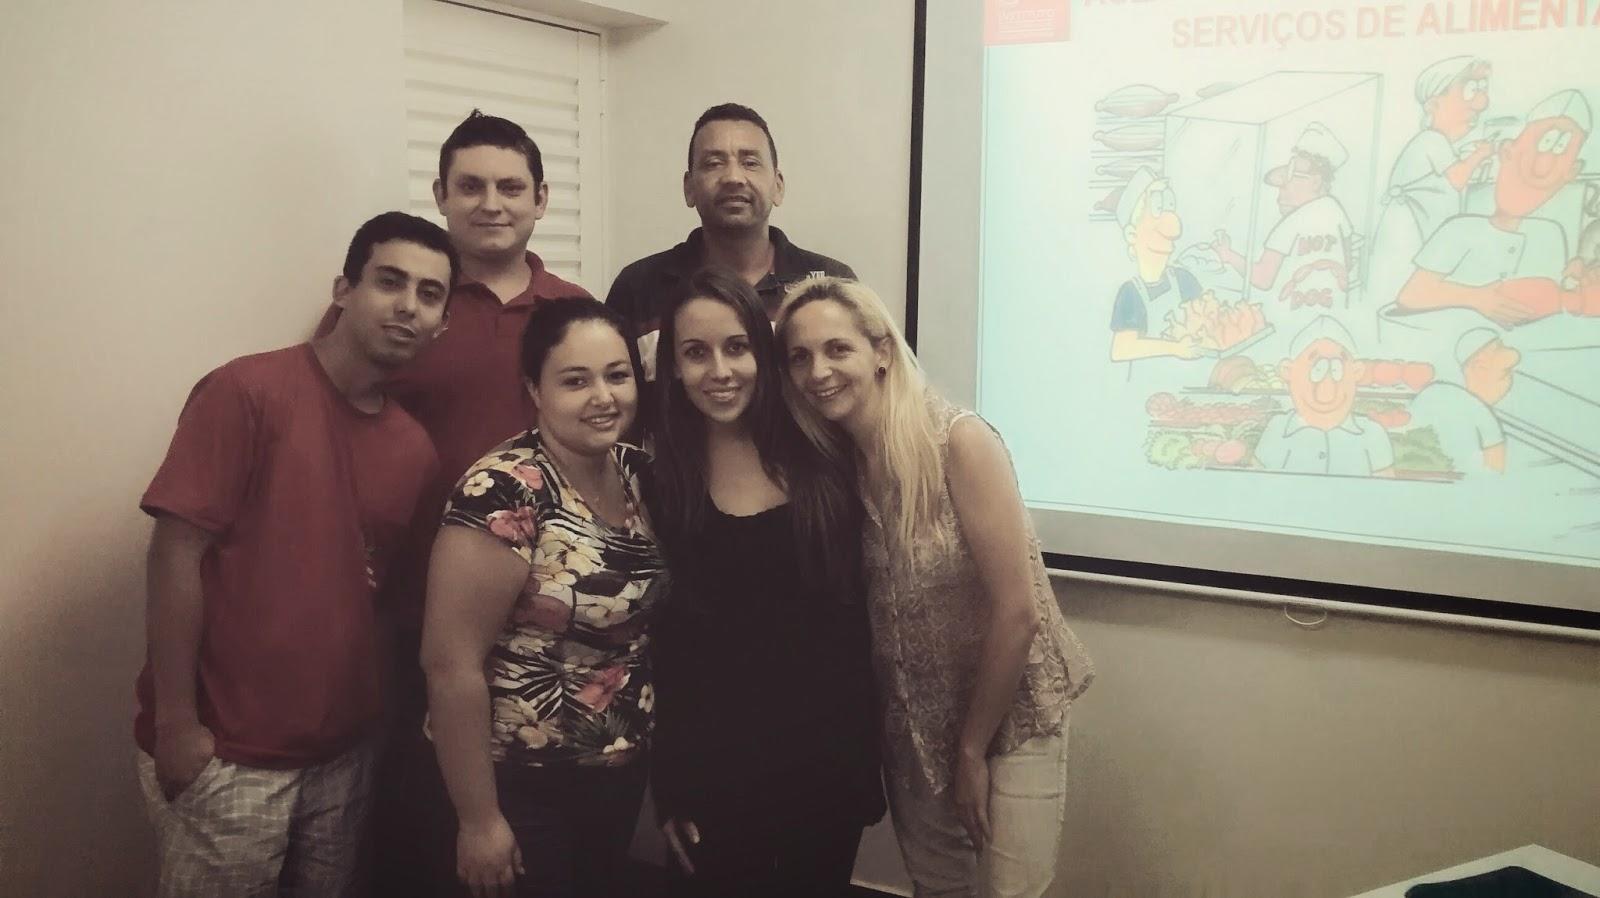 Parceria entre Mayara Vale e Instituto Franco Brasileiro de Gastronomia – IFBG